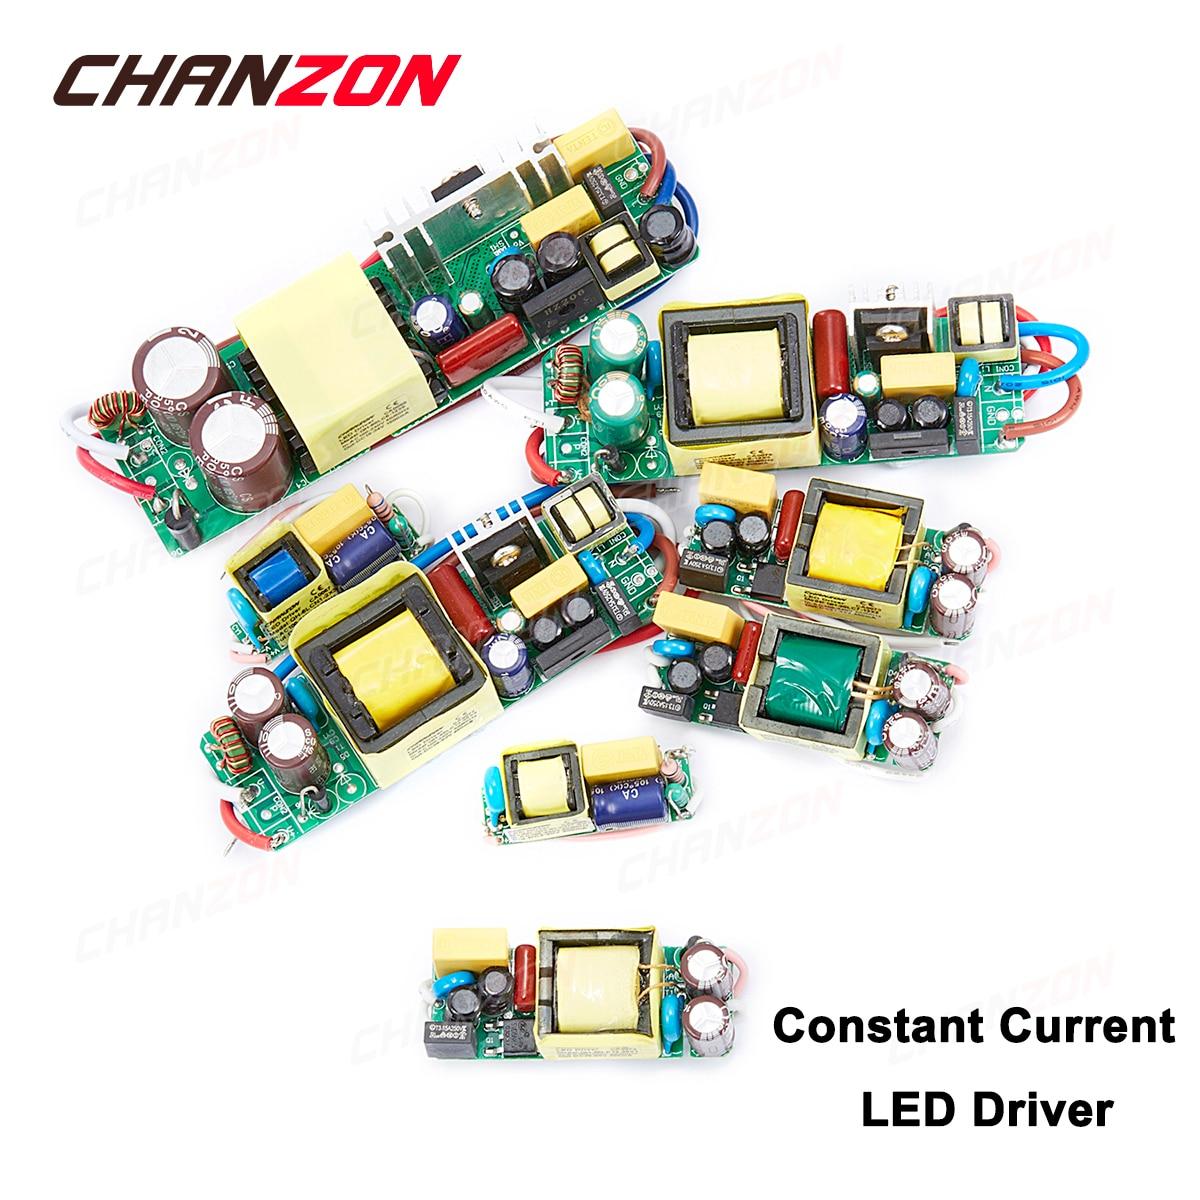 Led Driver 300ma 600ma 900ma 1500ma Waterproof Lighting Transformers Together With 10 Watt Circuit On High Current Constant 5w 10w 20w 30w 50w 450ma Ac Dc